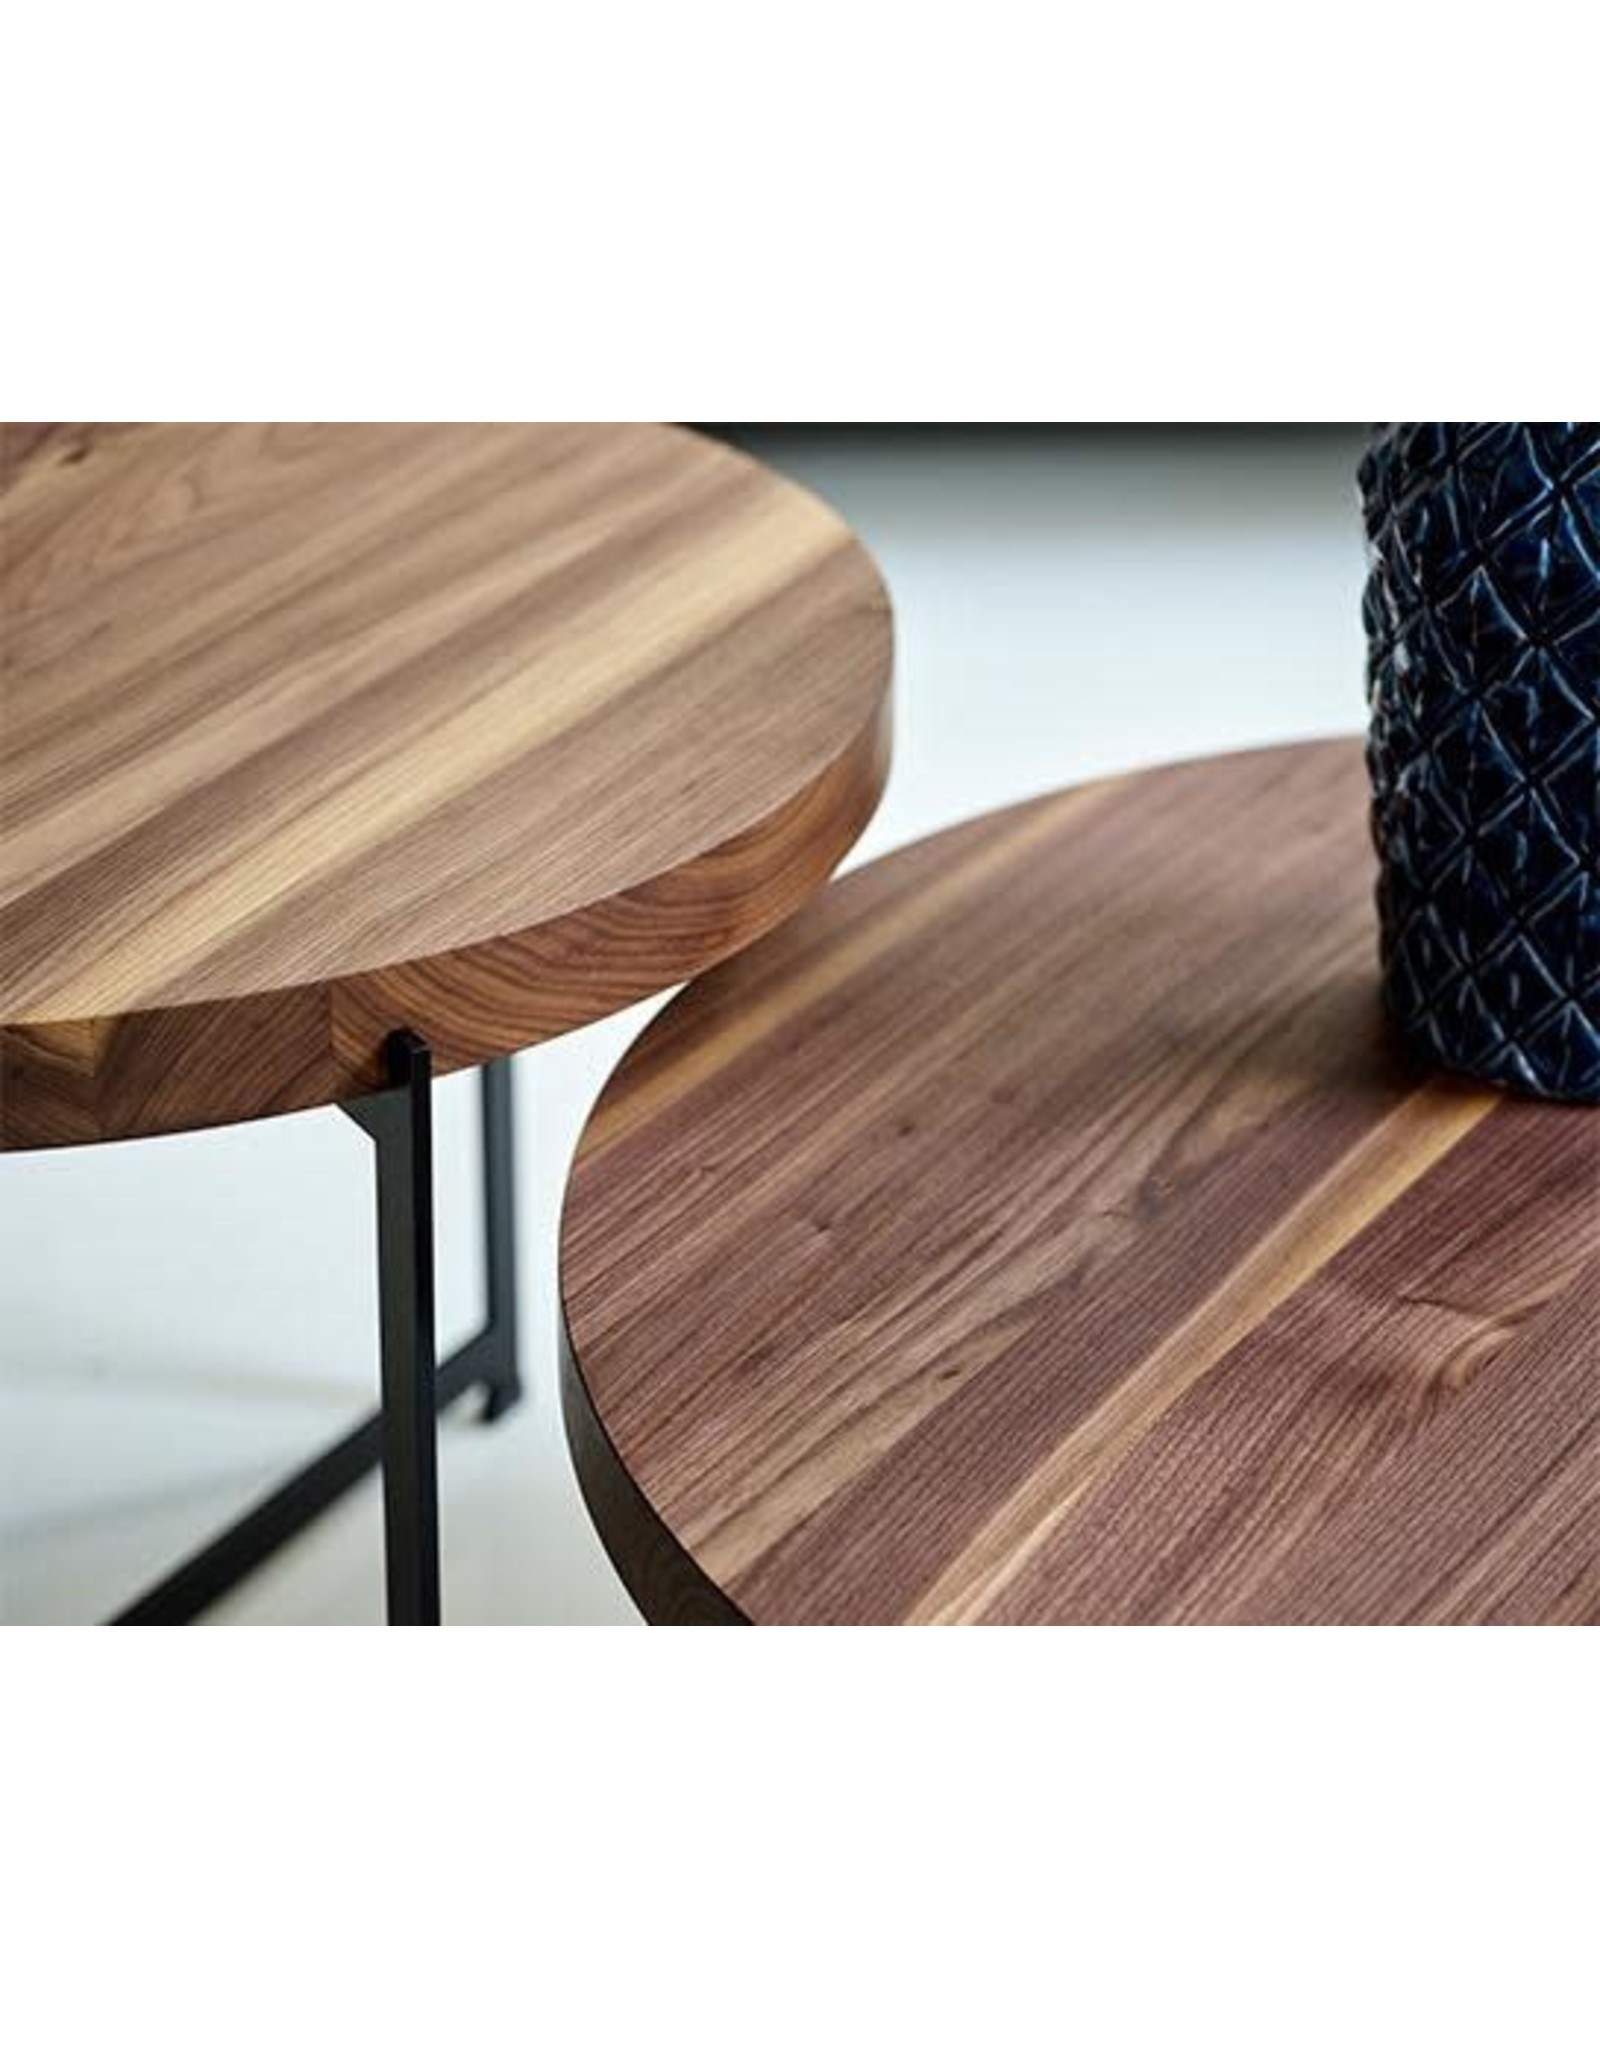 PLATEAU COFFEE TABLE